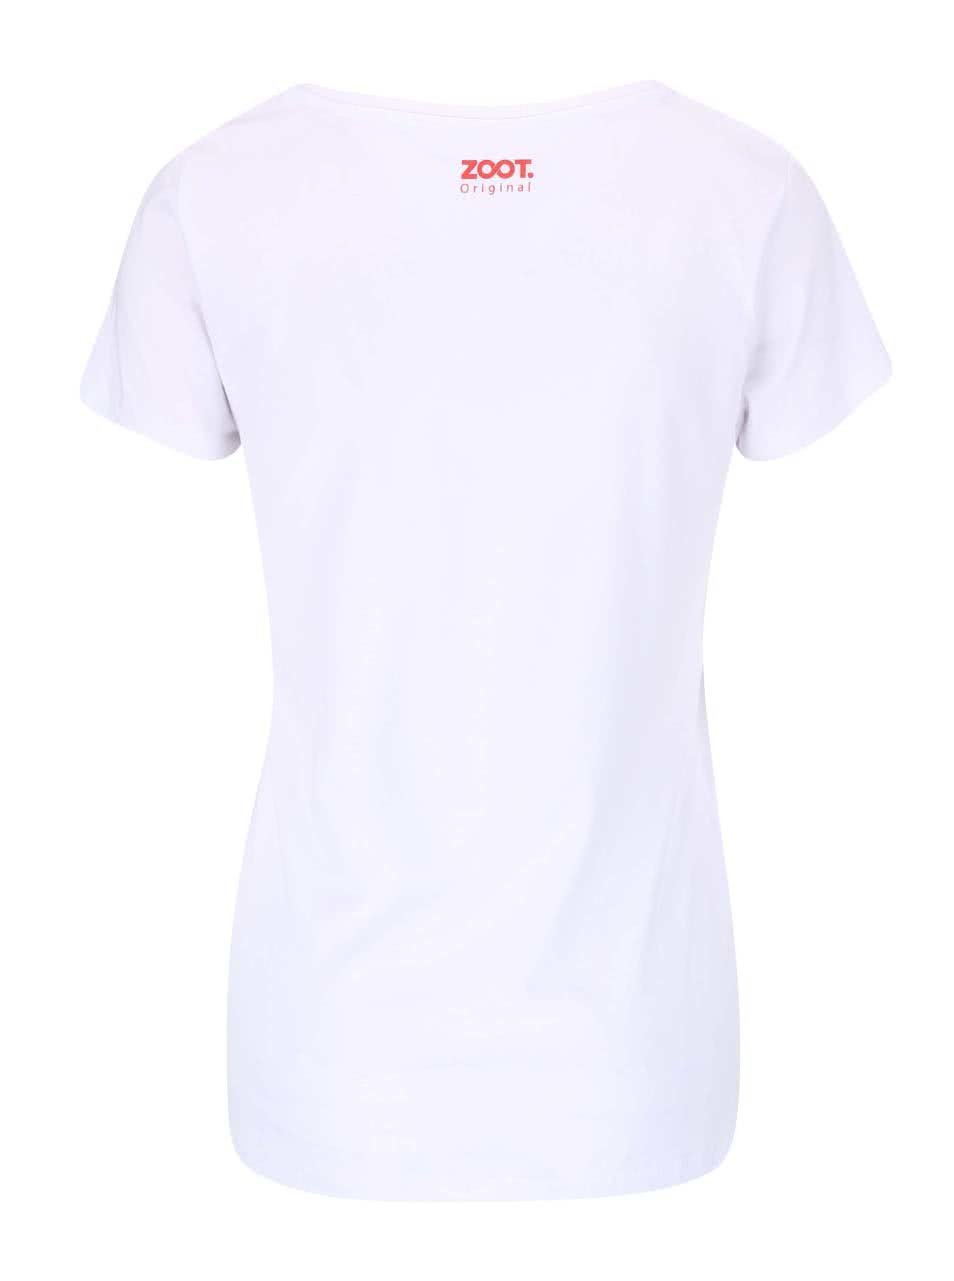 1bf95dca2767 Biele dámske tričko ZOOT Originál Slovenka ...